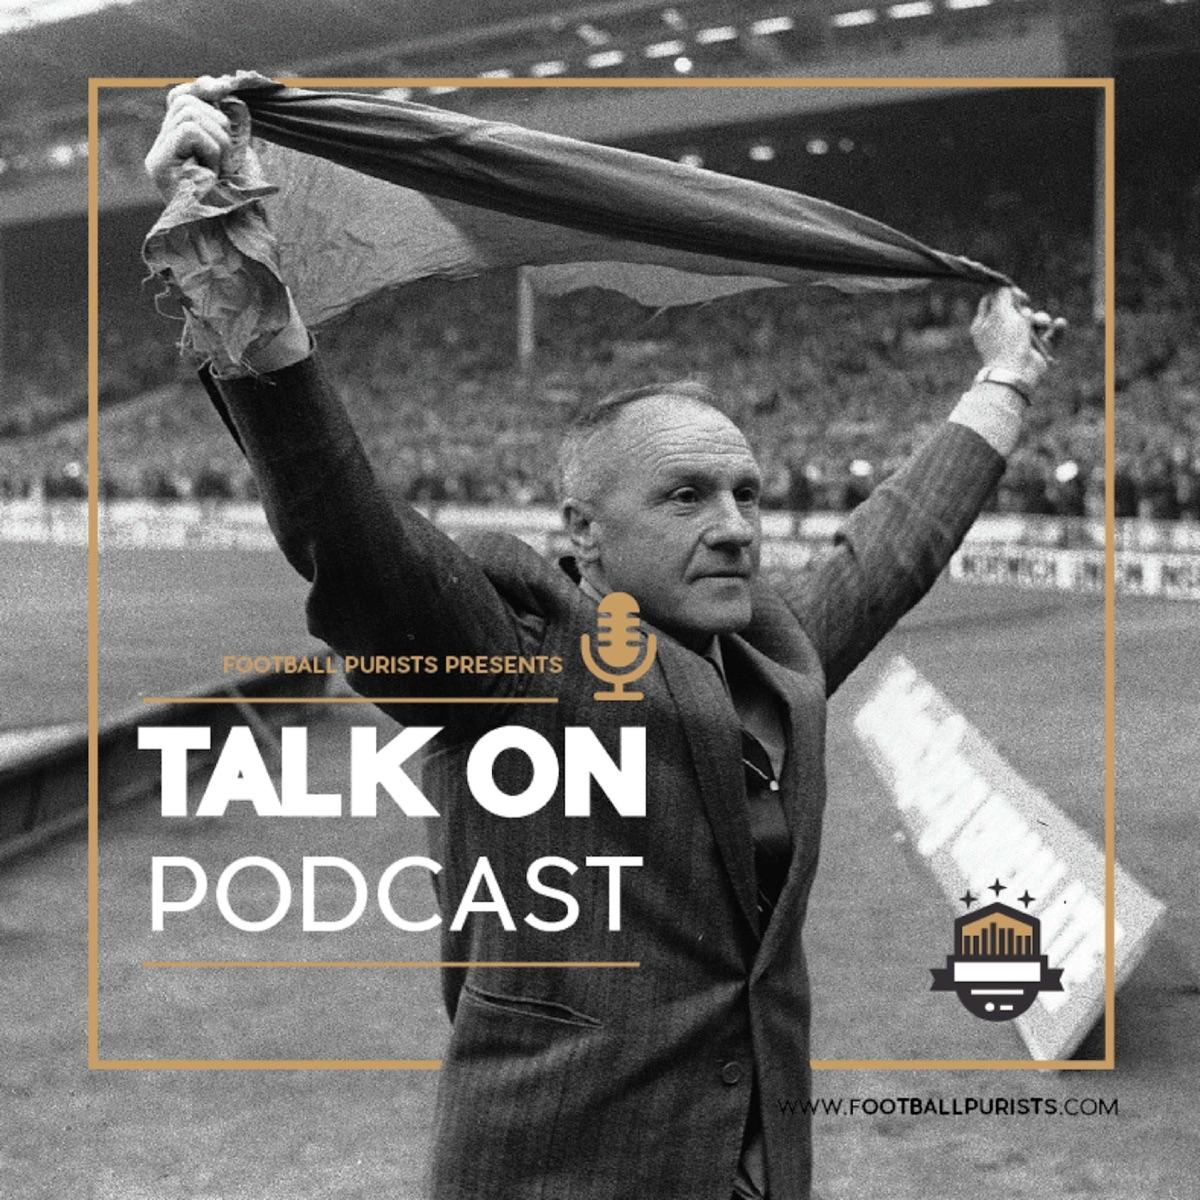 Talk On Podcast